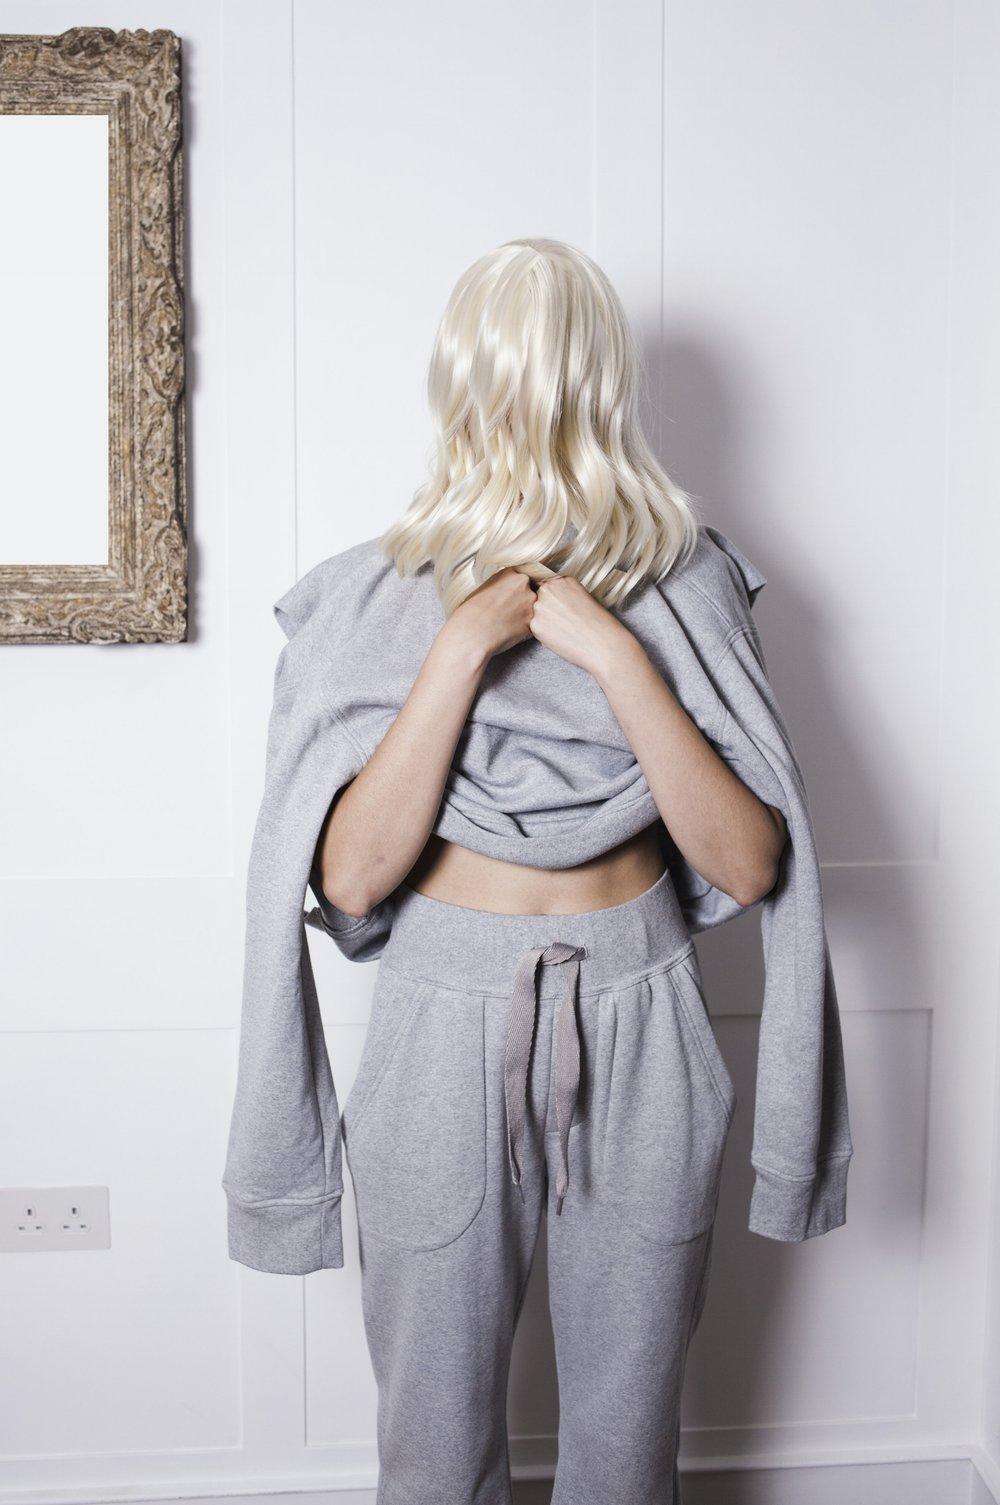 DRESS SUPERBASICS Inset Sleeve Flat Sweatshirt and Superbasic Joggers in Grey Marl #dressltd